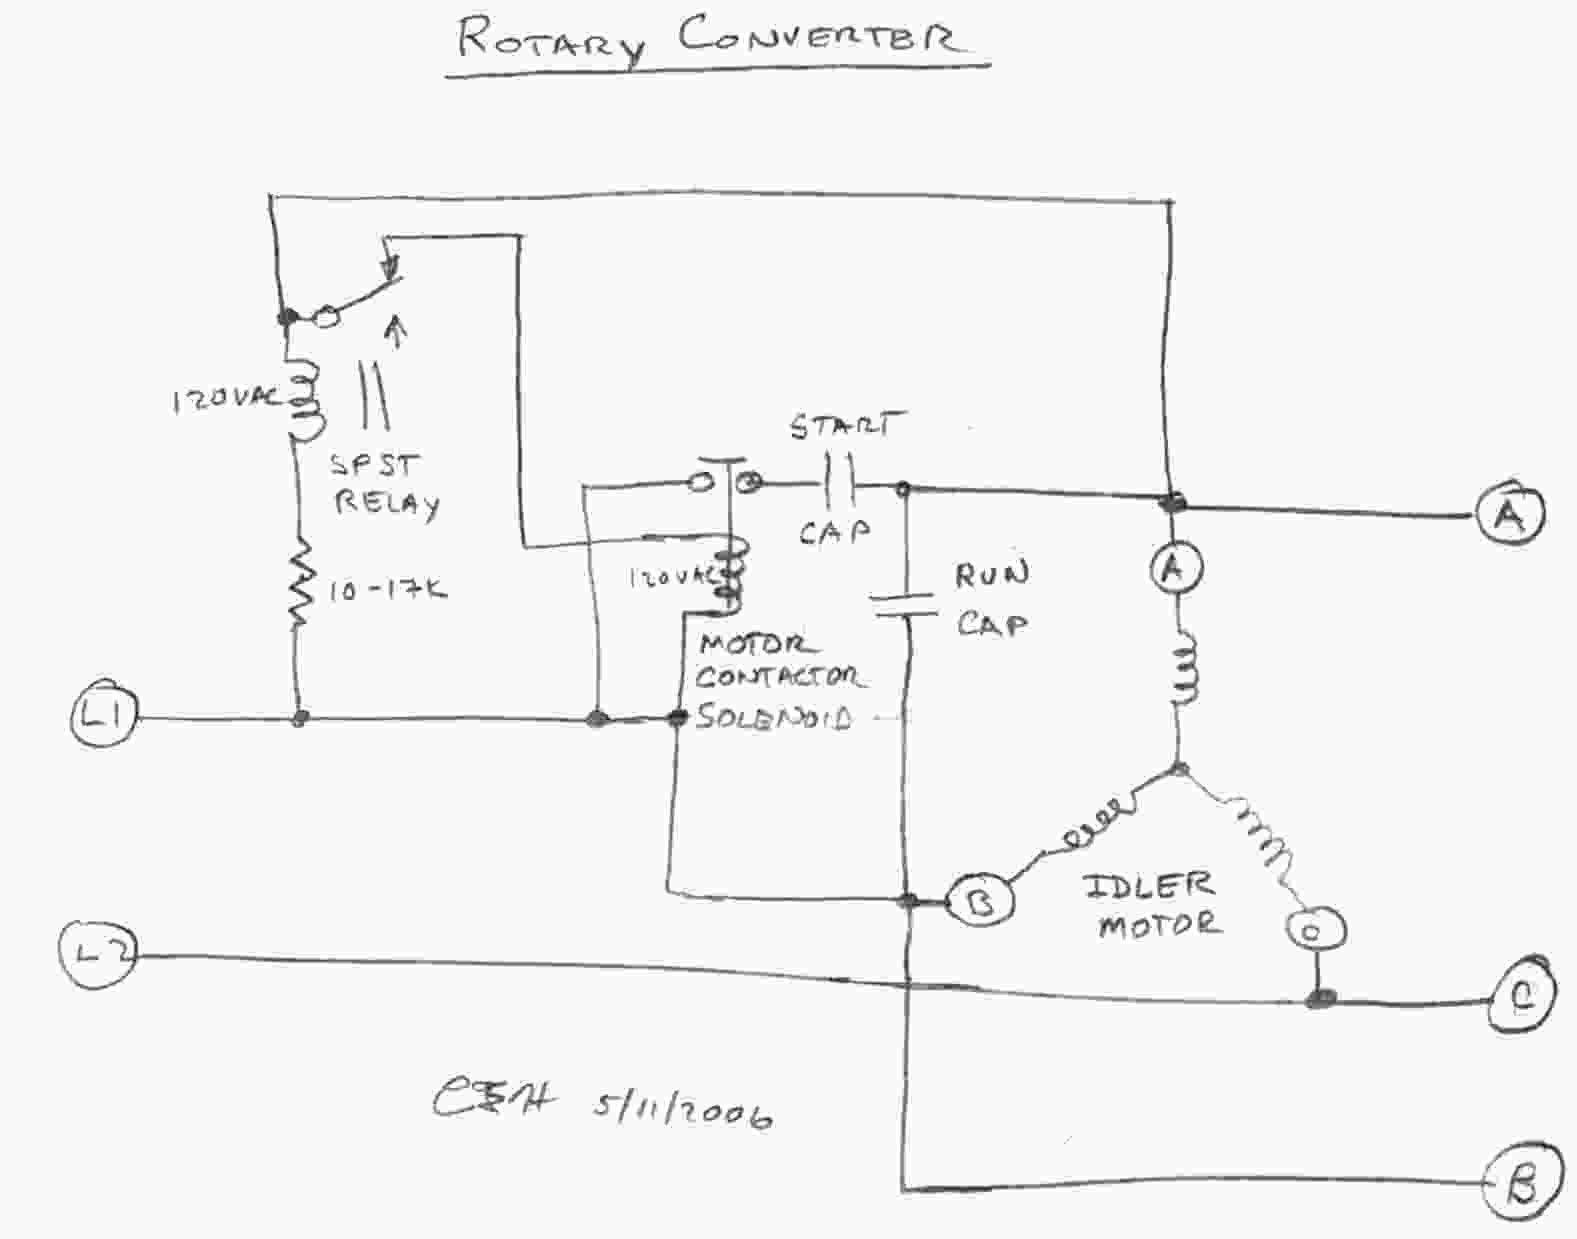 medium resolution of 3 phase generator wiring diagram lima wiring diagram sch 3 phase generator wiring diagram lima wiring